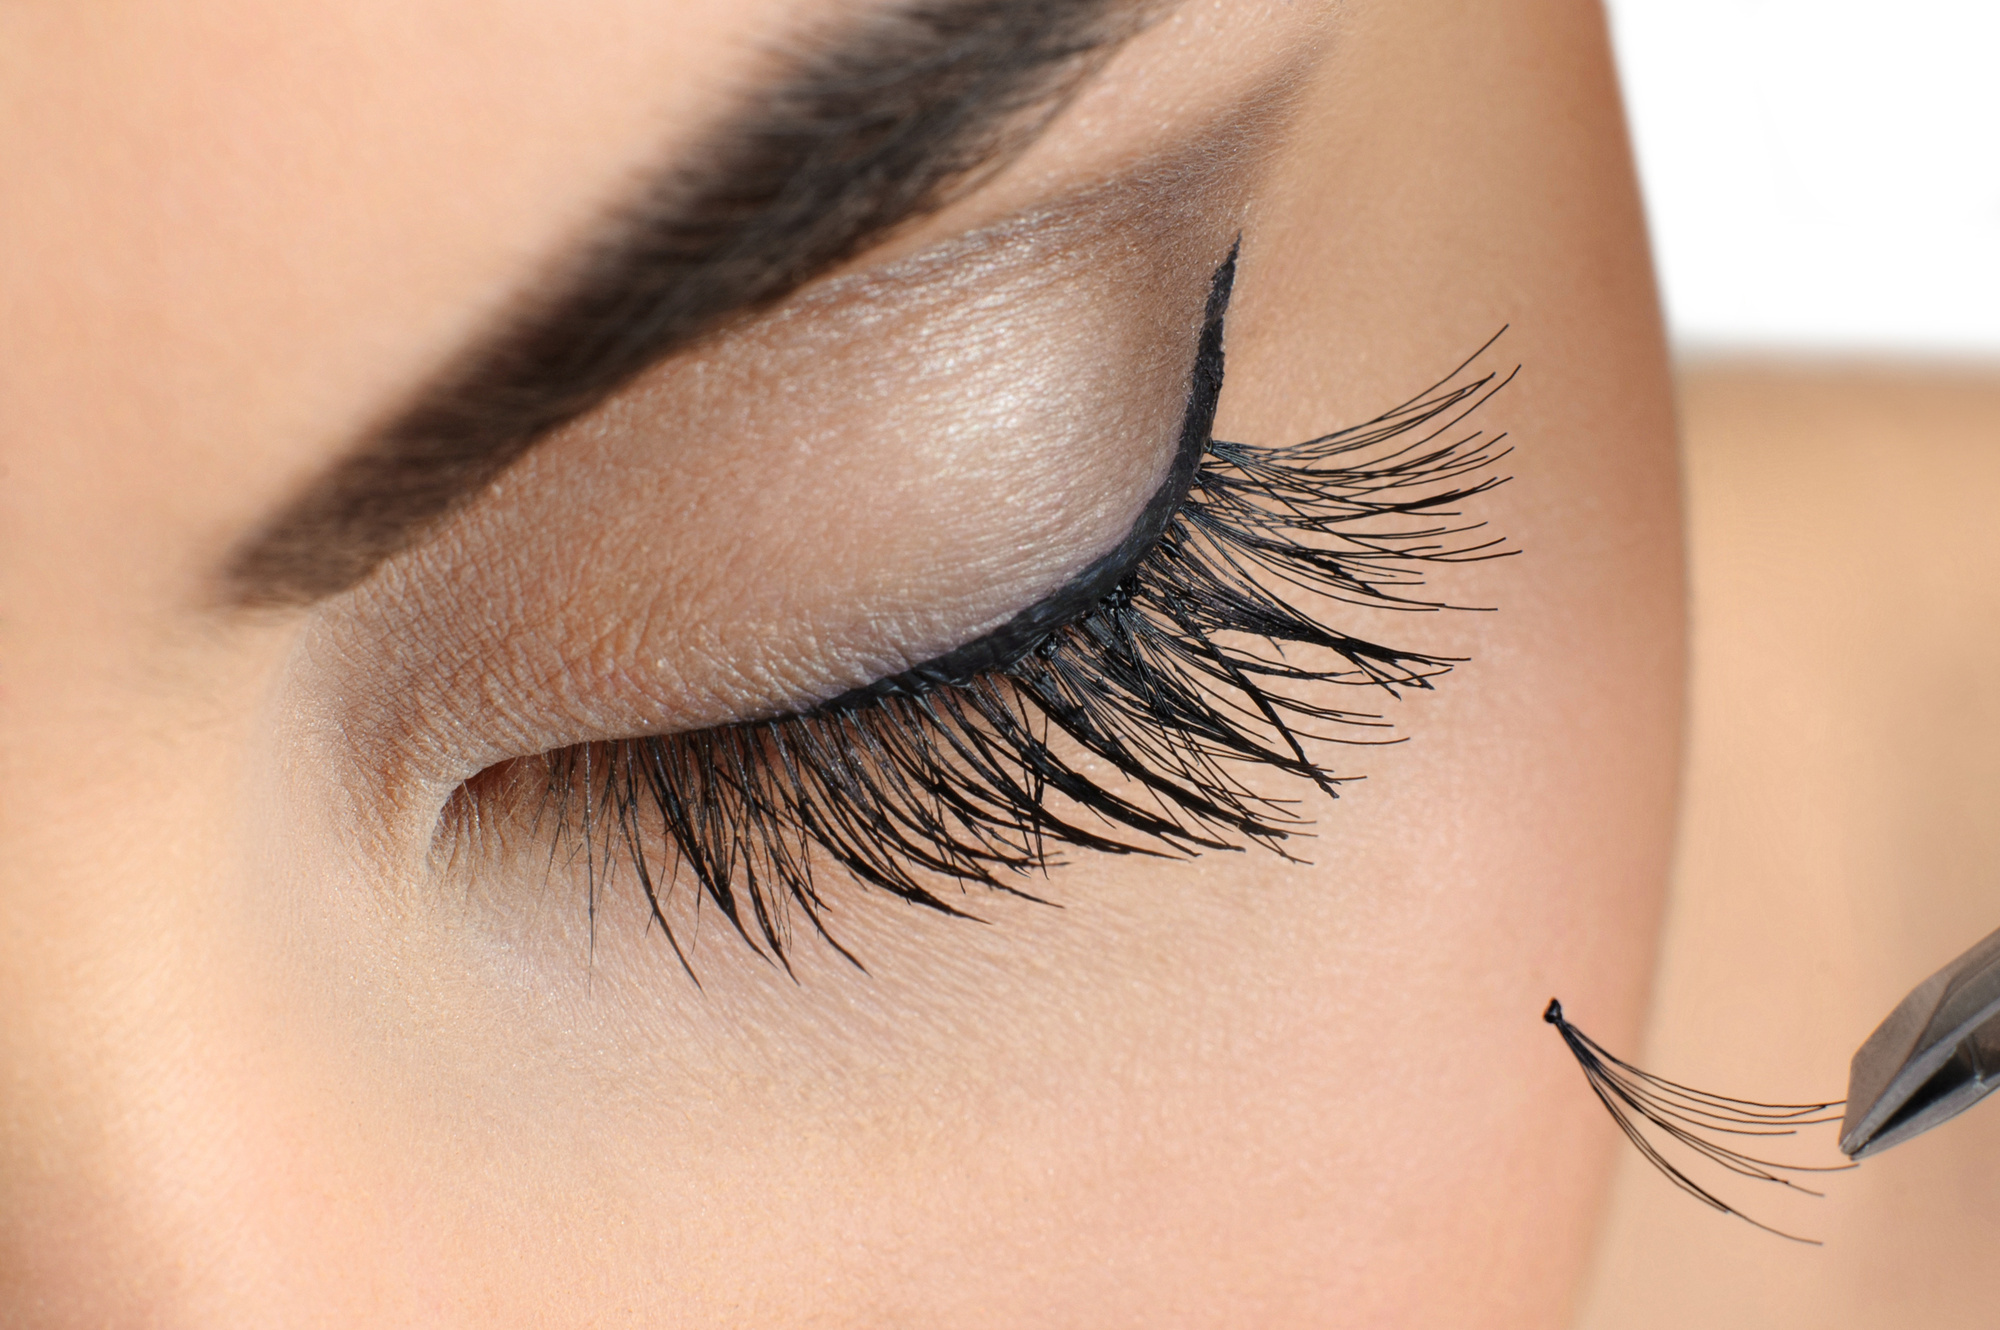 Remove Eyelash Extensions